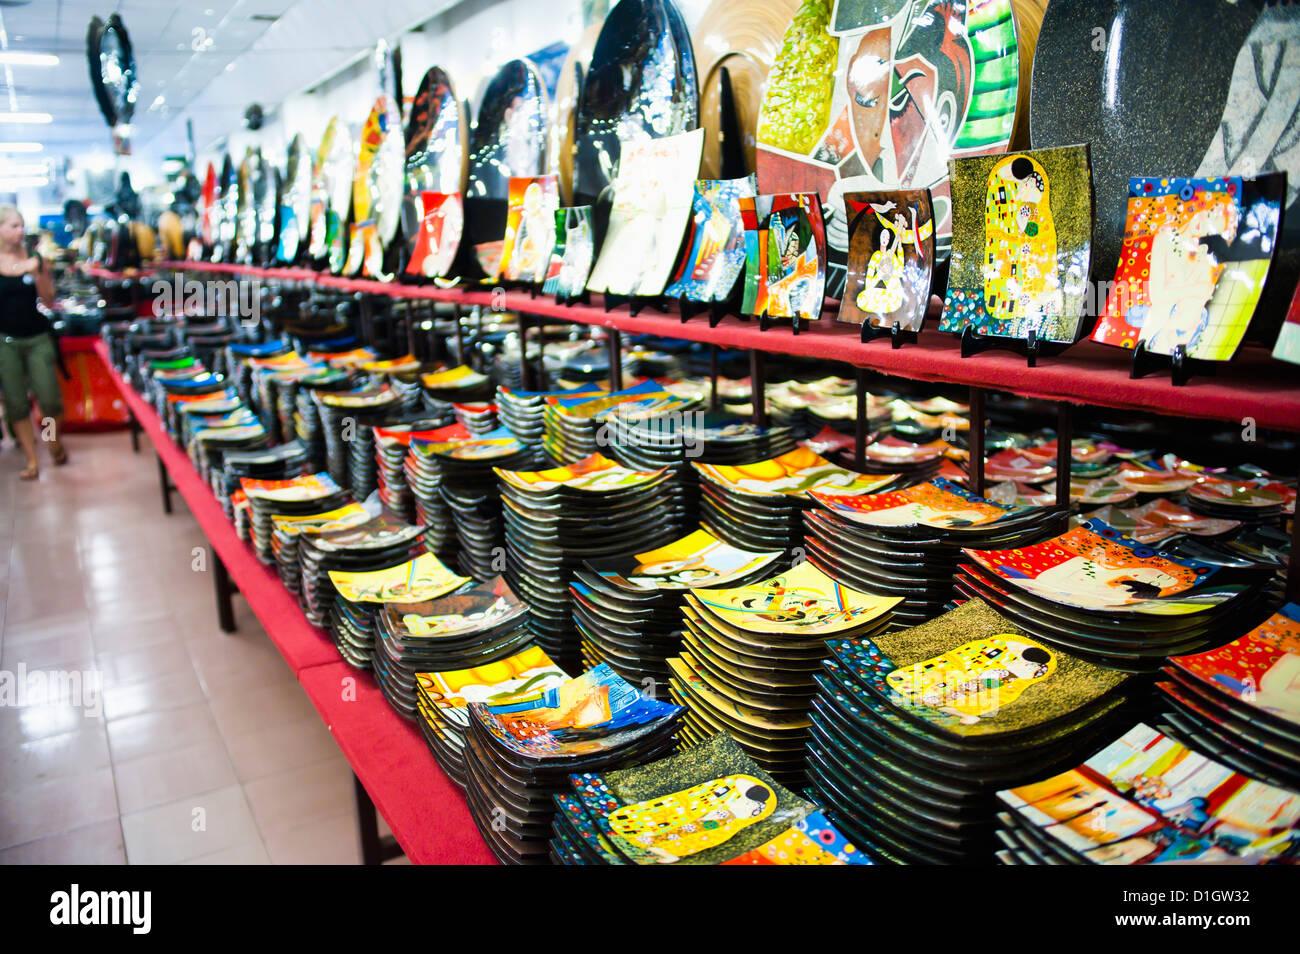 Souvenir shop in Ho Chi Minh City (Saigon), Vietnam, Indochina, Southeast Asia, Asia - Stock Image